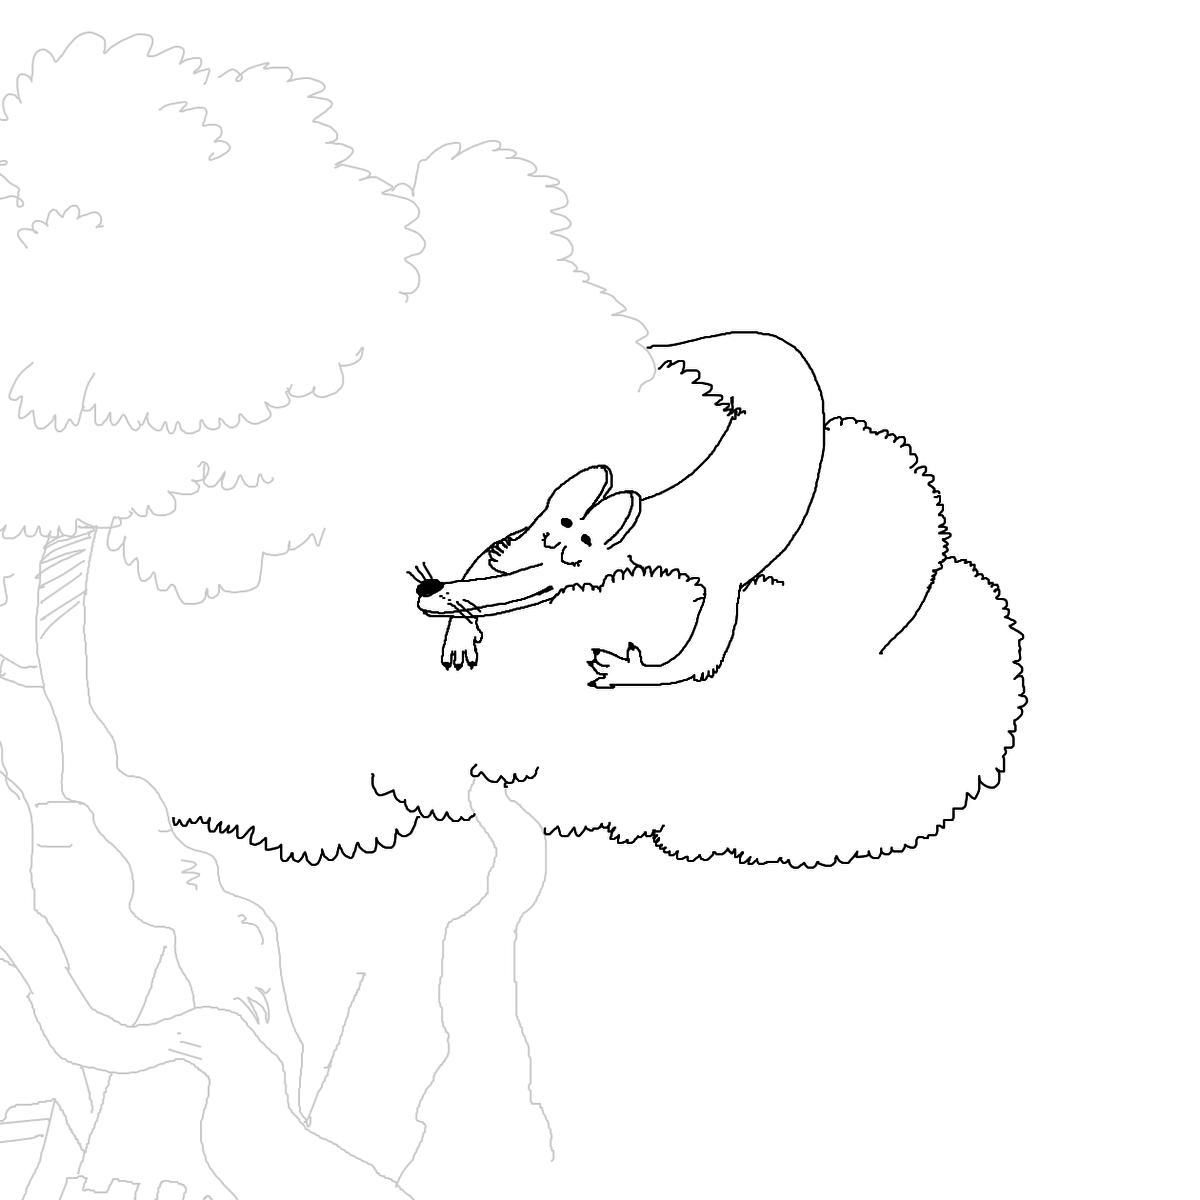 BAAAM drawing#3777 lat:78.4176025390625000lng: -4.4394693374633790